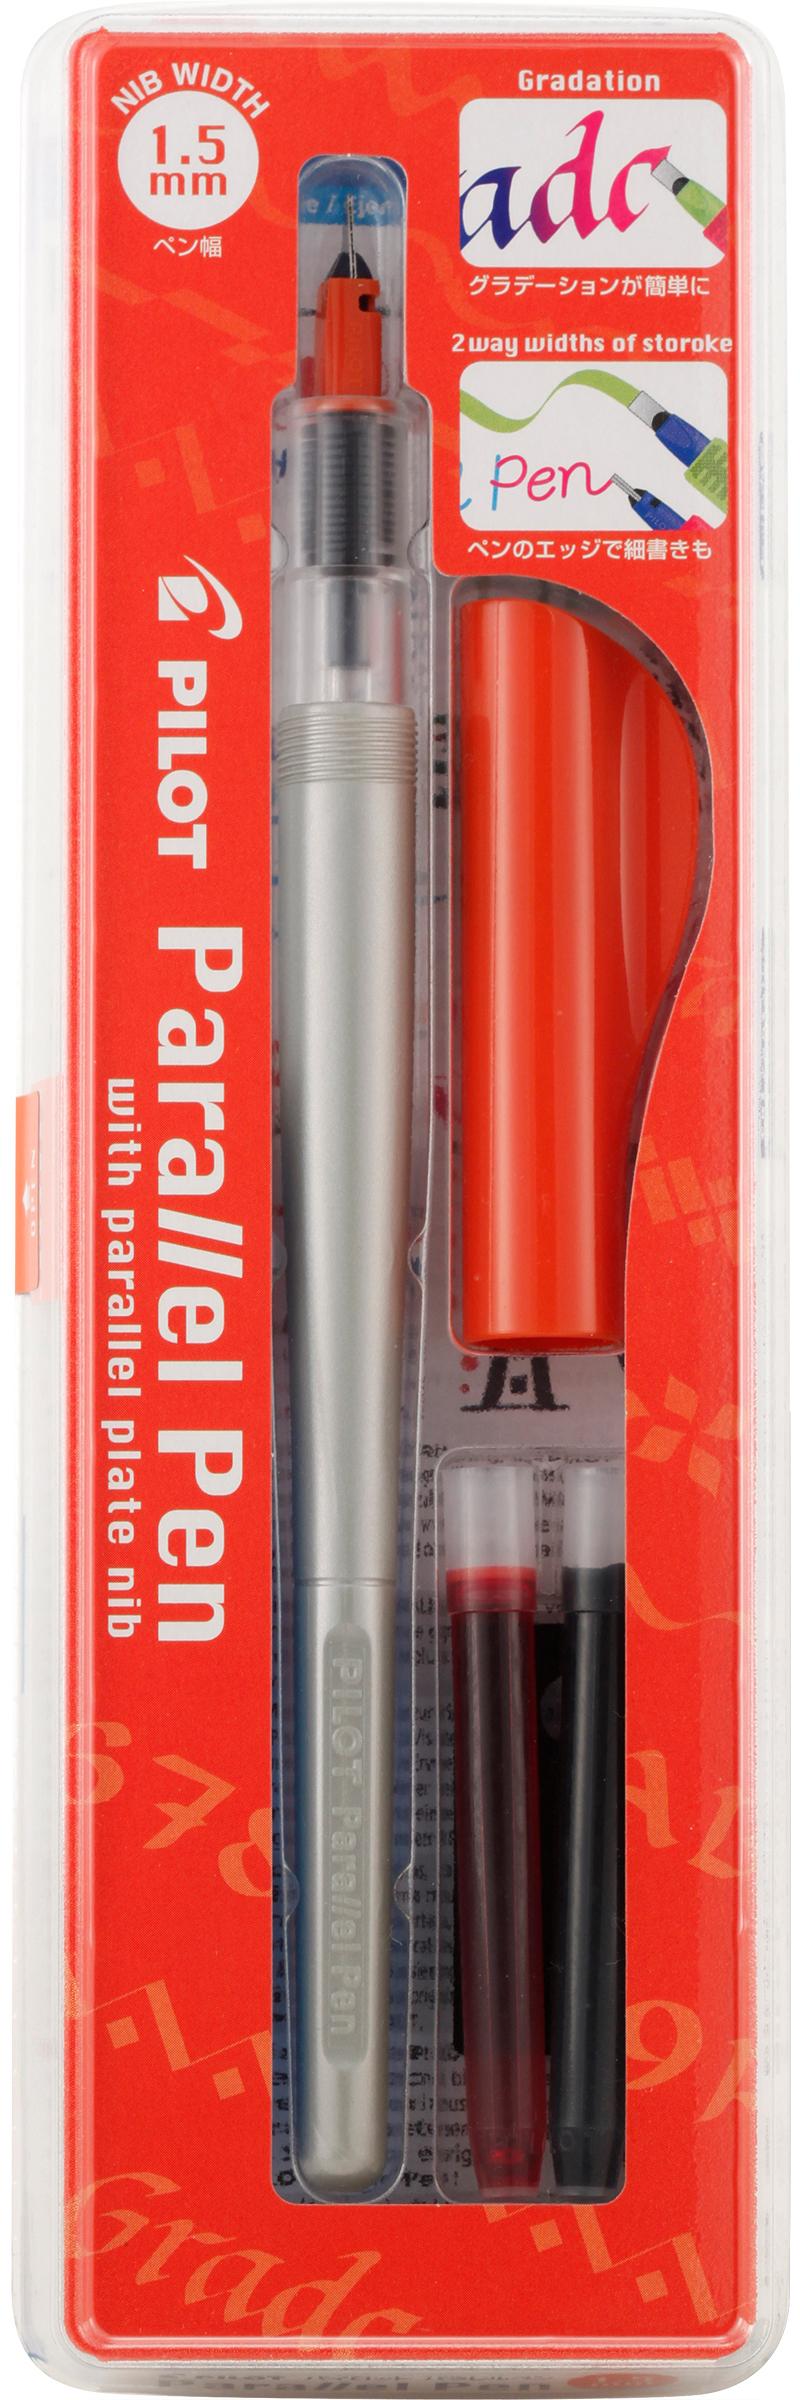 Pilot Parallel Calligraphy Pen Set 1.5mm Nib-Black & Red Ink